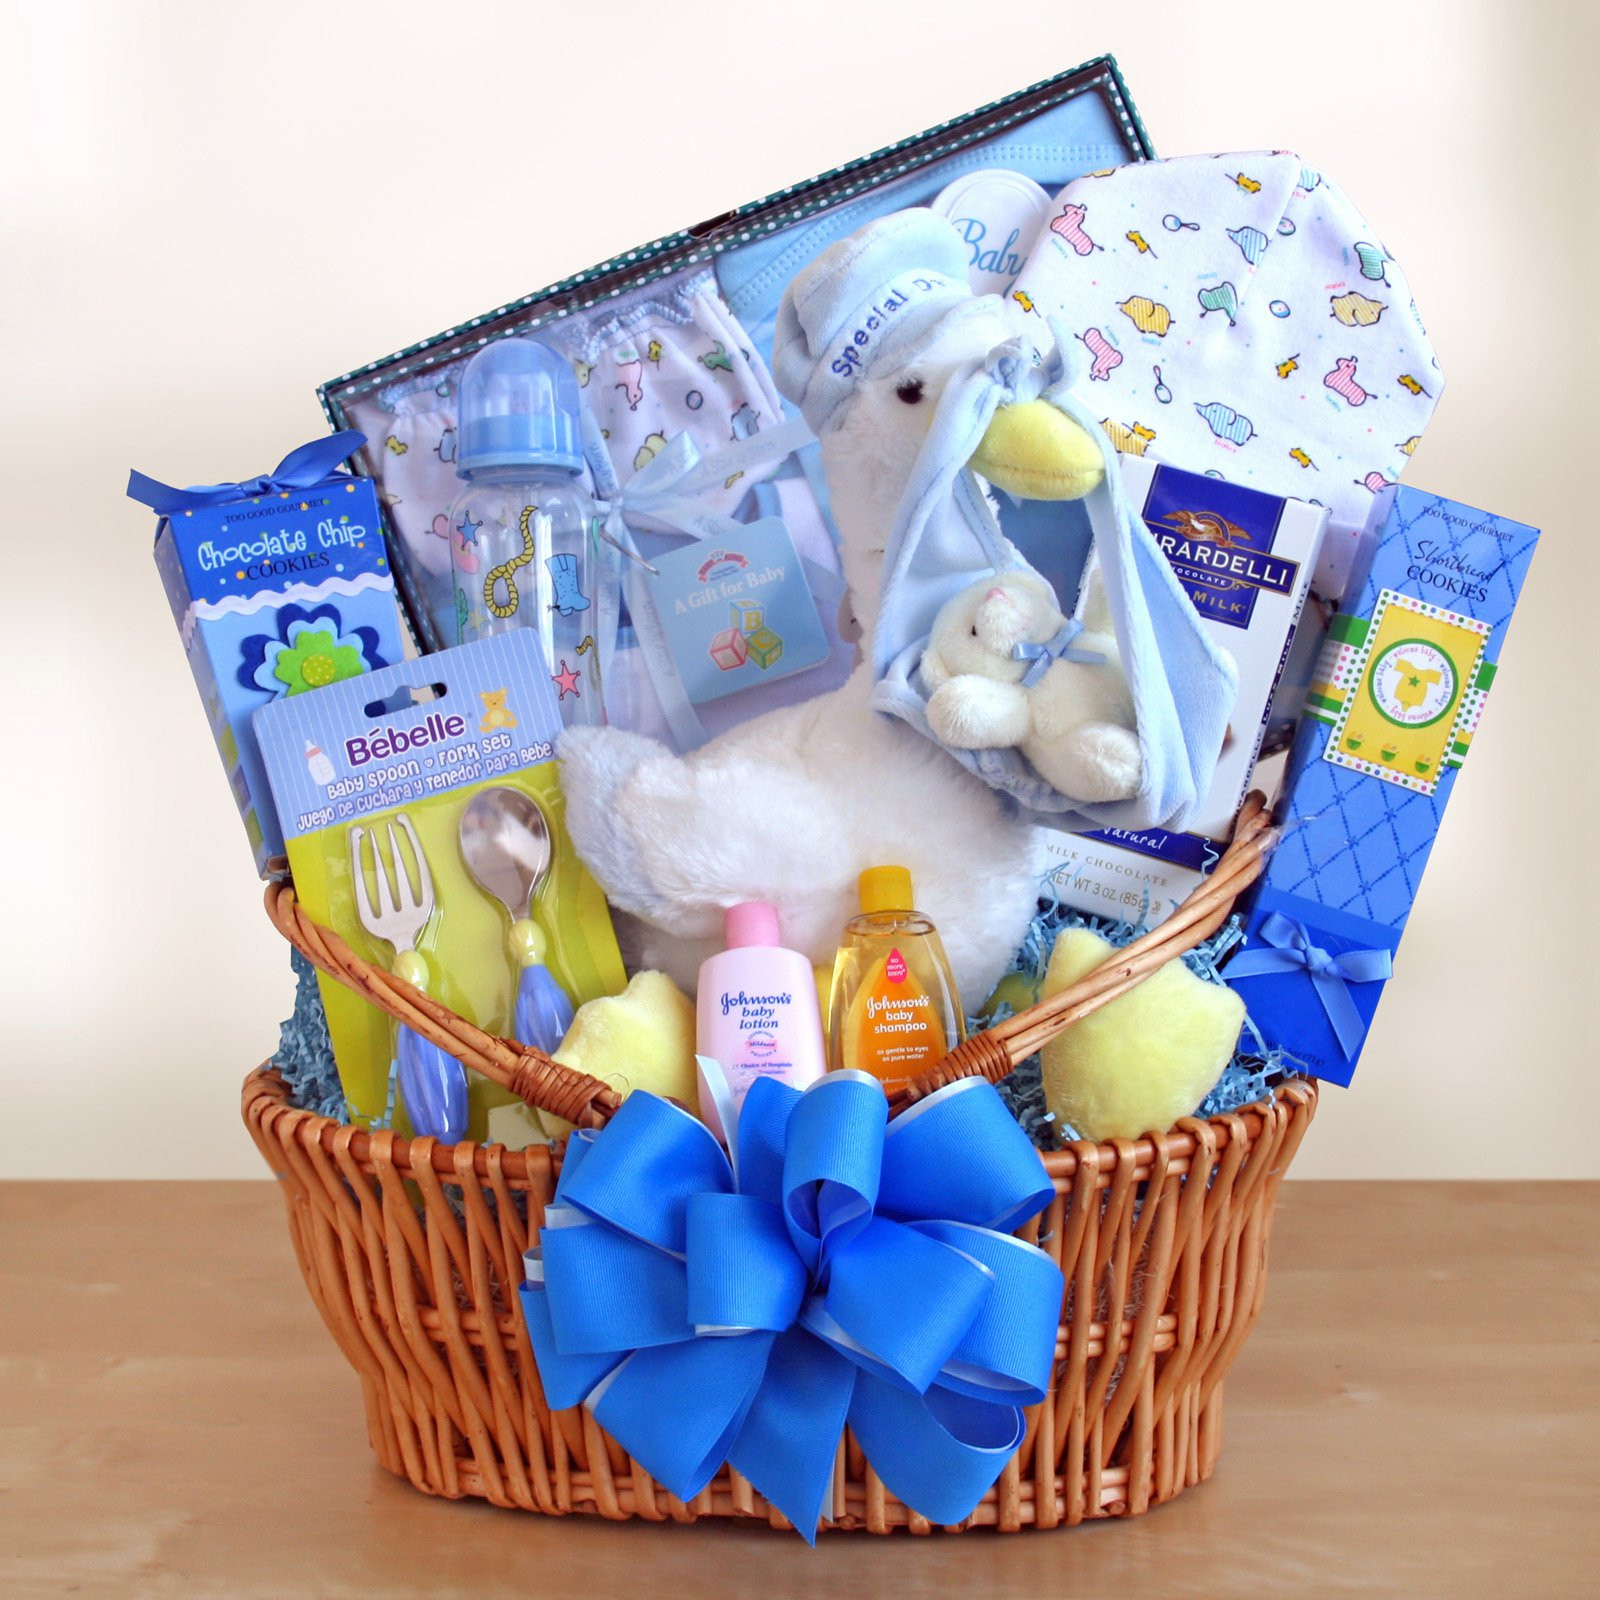 Baby Boy Gift Basket Ideas  Special Stork Delivery Baby Boy Gift Basket Gift Baskets